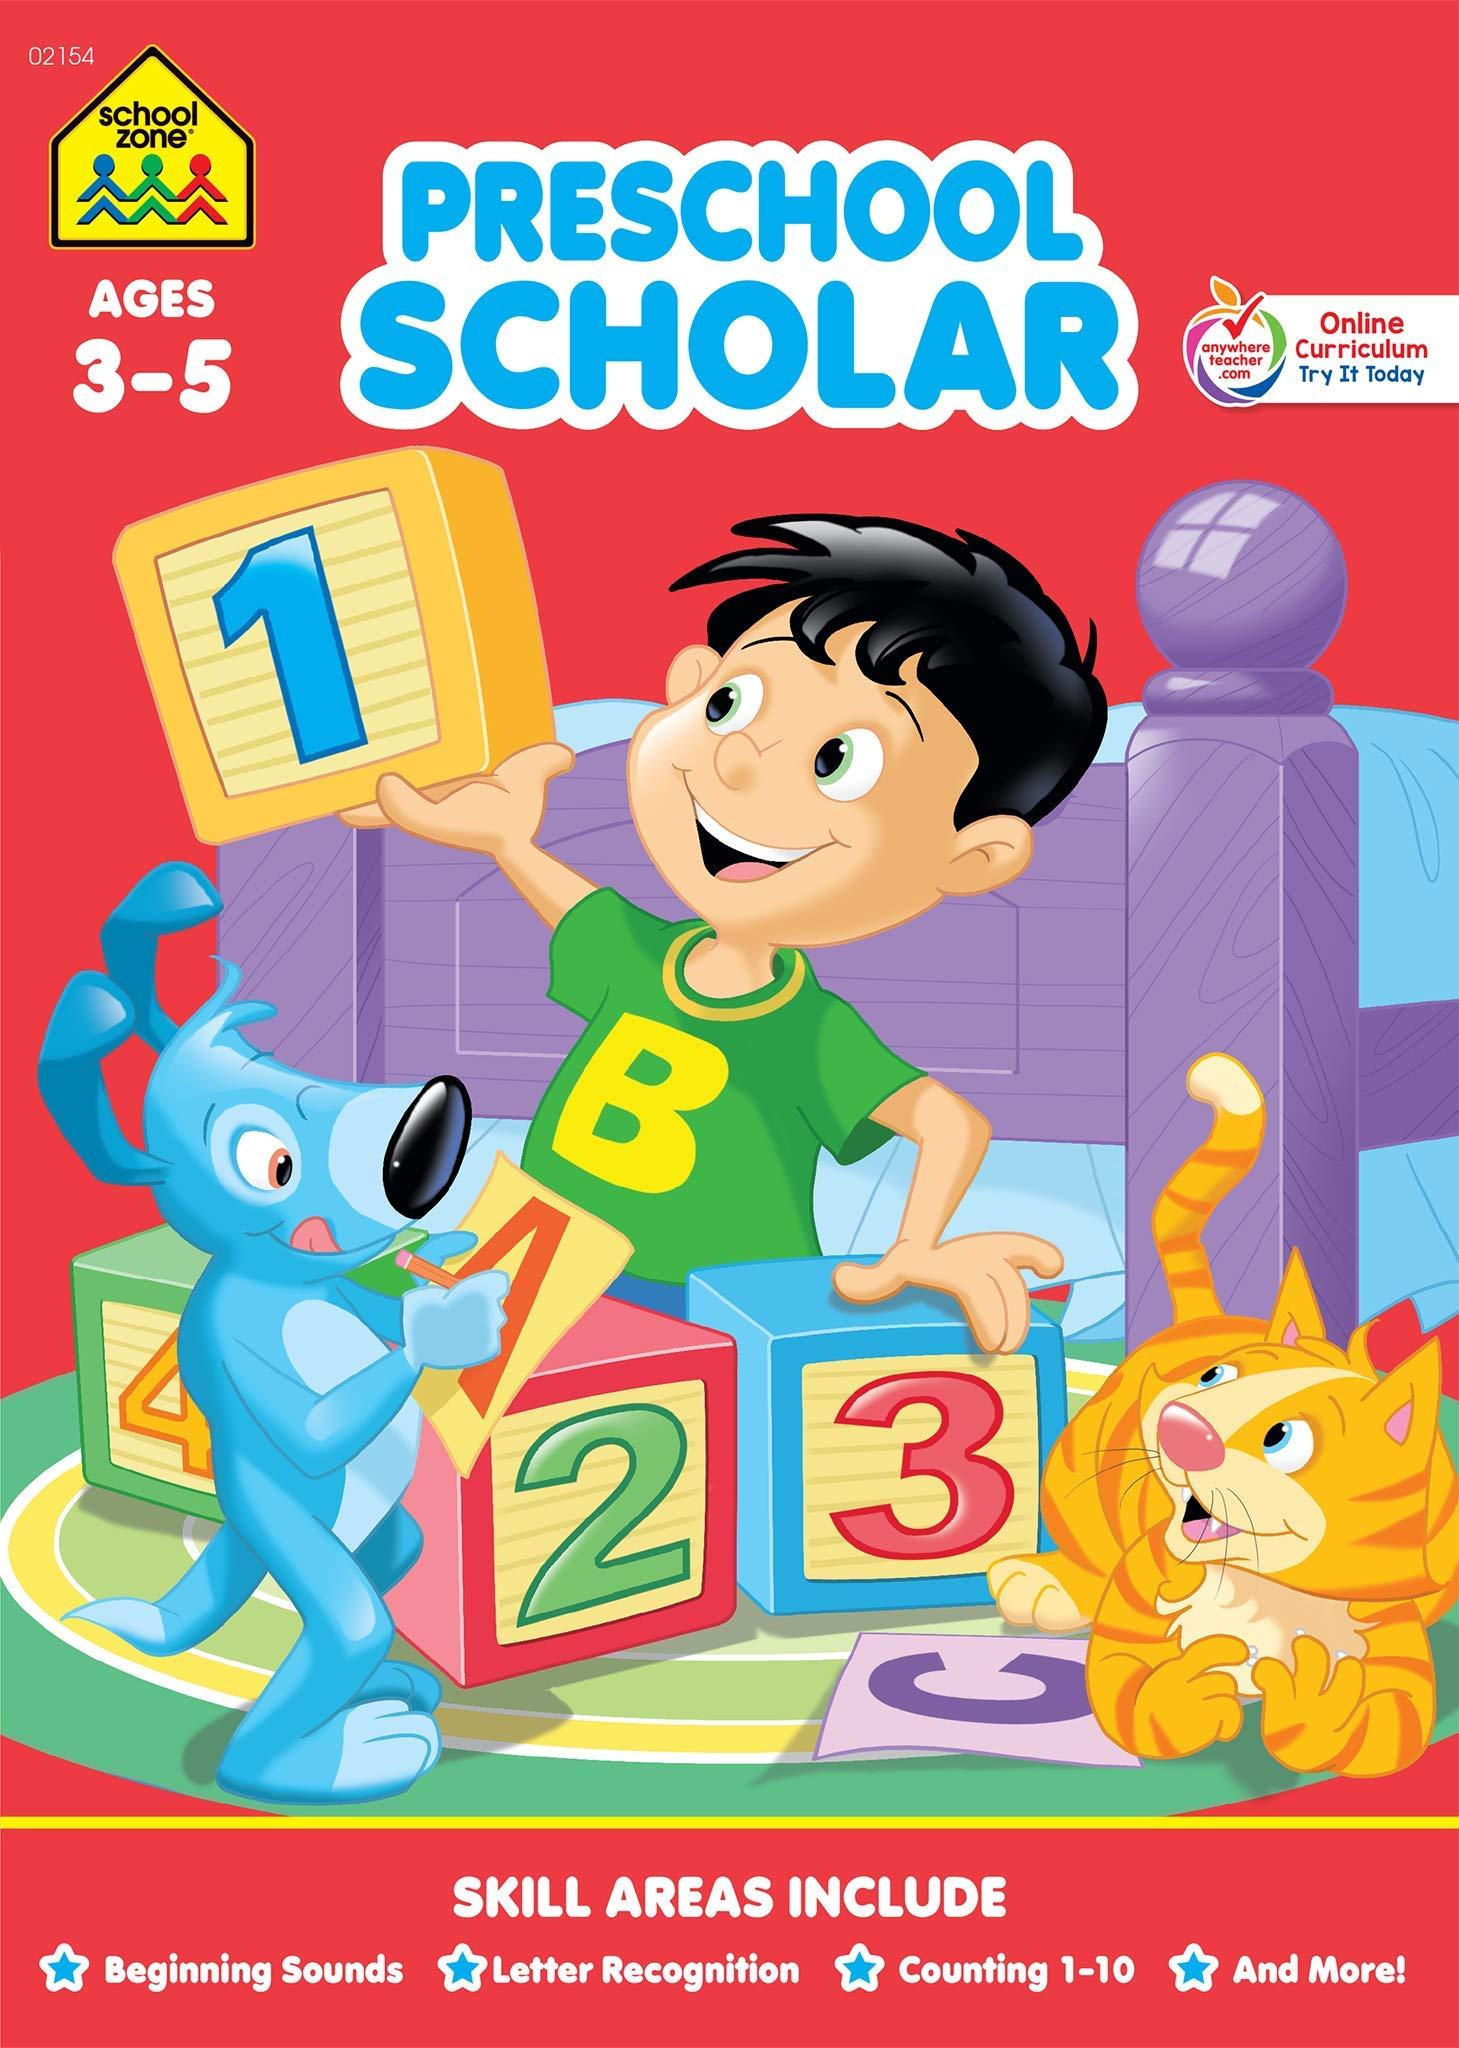 School zone scholar workbook. Textbook clipart preschool book